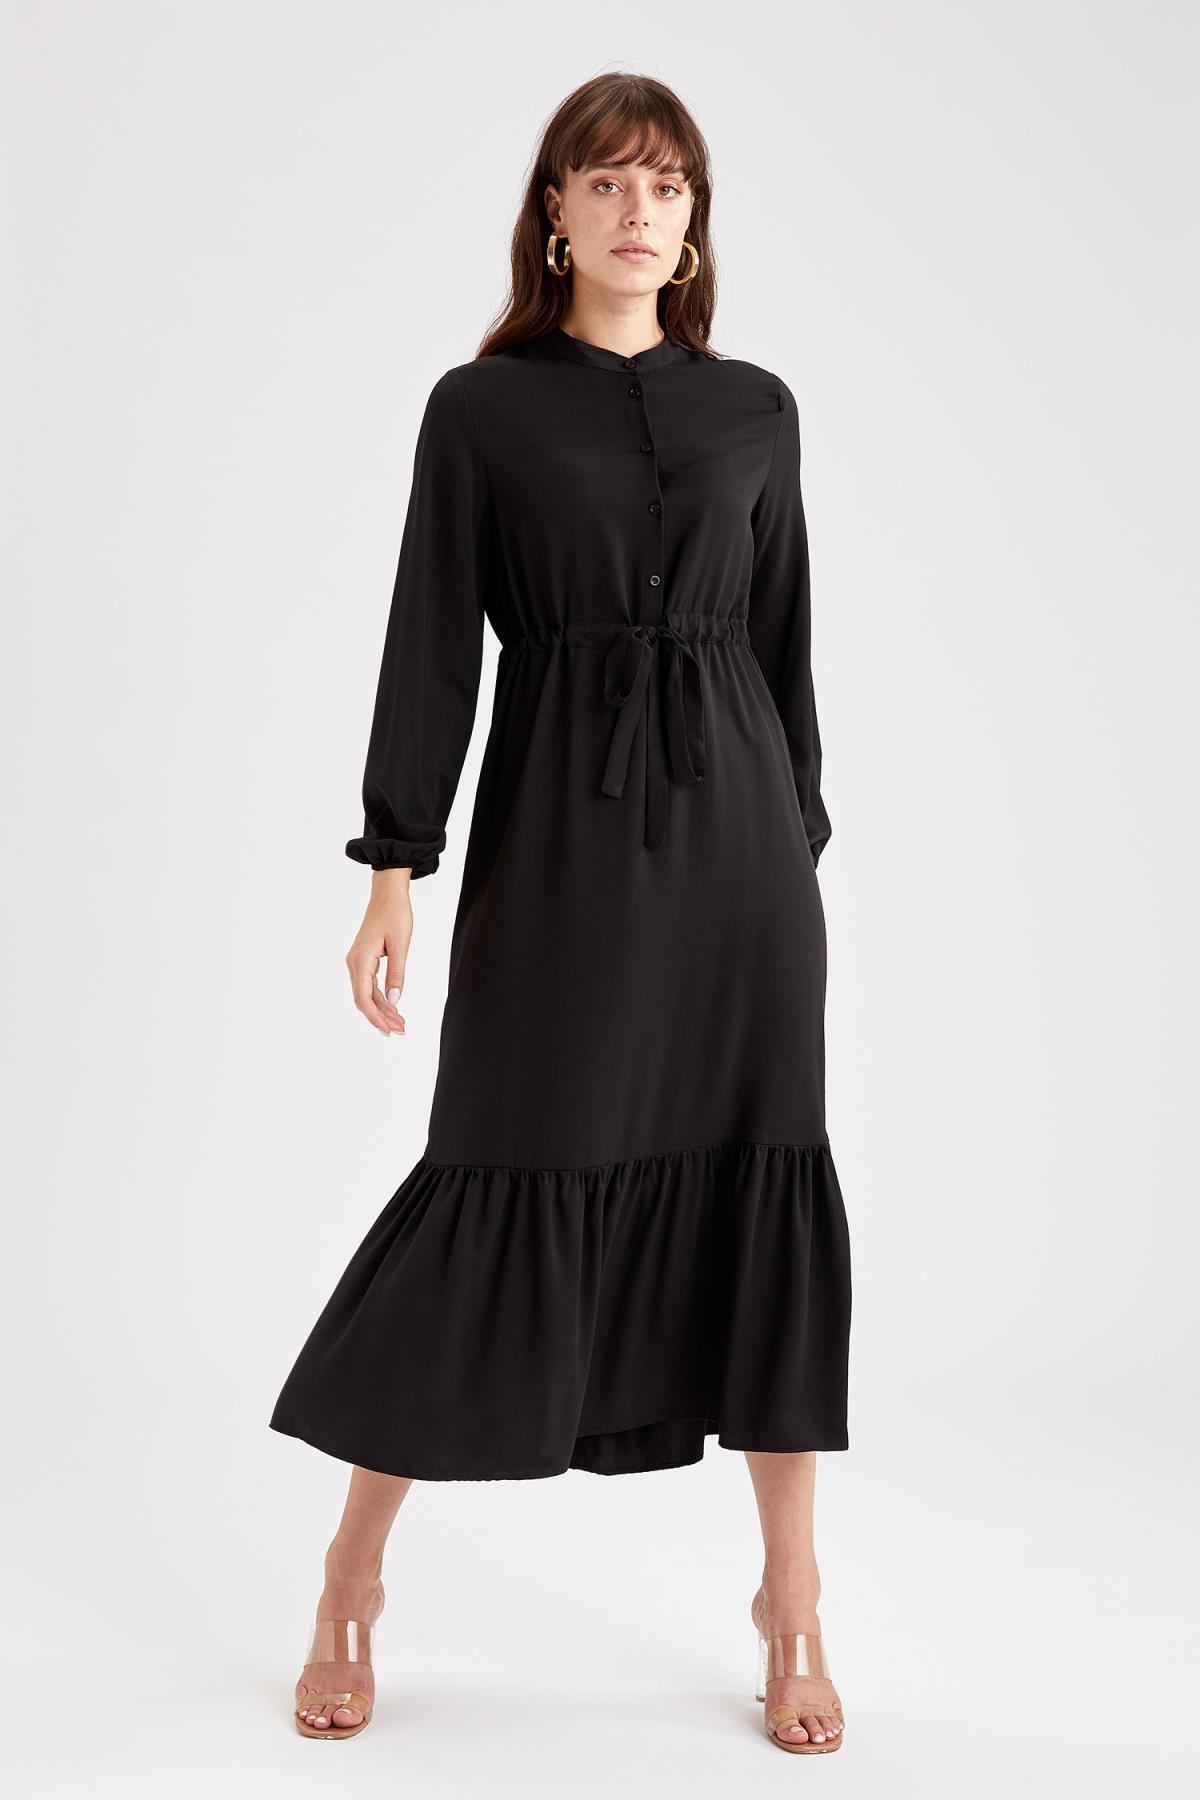 DeFacto Kadın Siyah Volanlı Beli Bağcıklı Balon Kollu Maxi ElbiseV9182AZ21AU